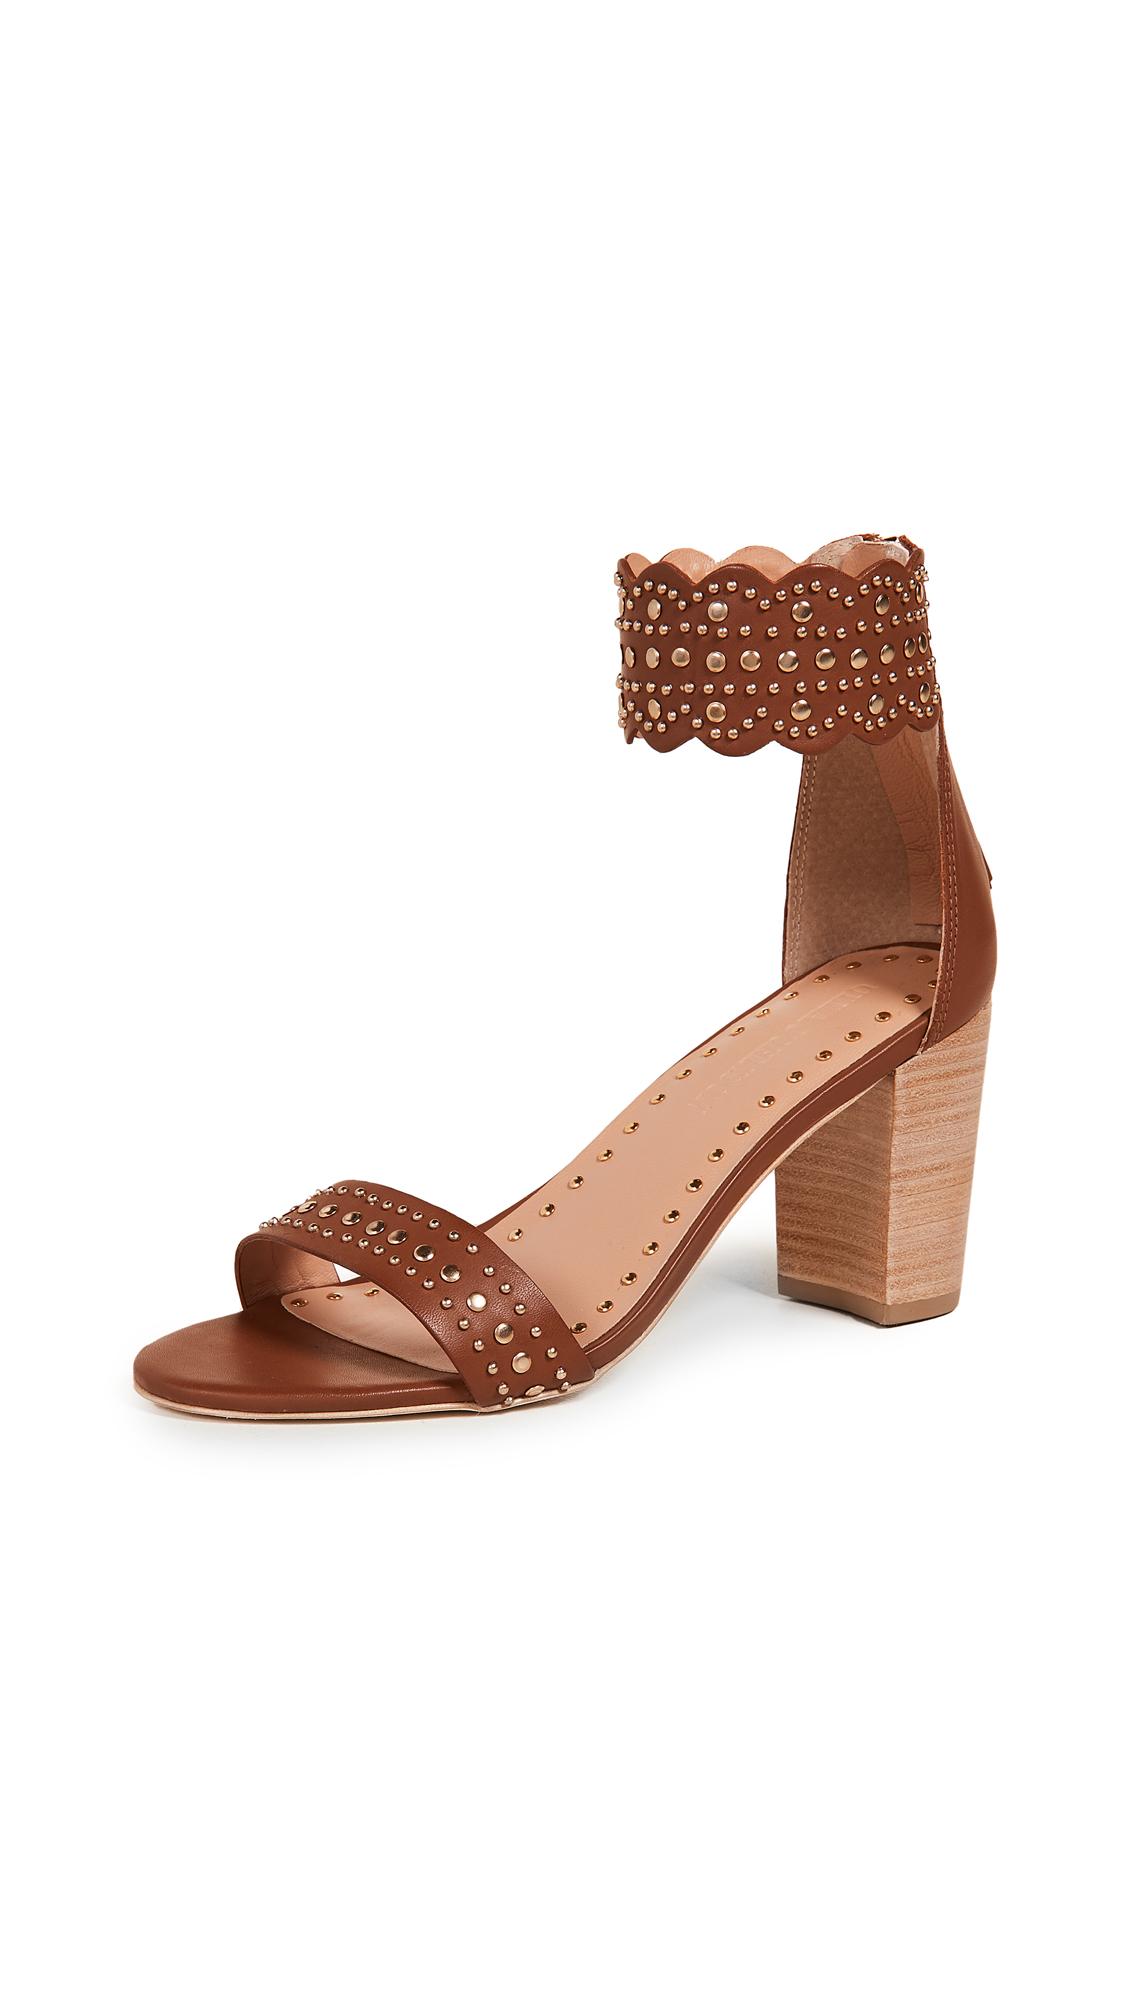 Ulla Johnson Solange Heel Sandals - Saddle